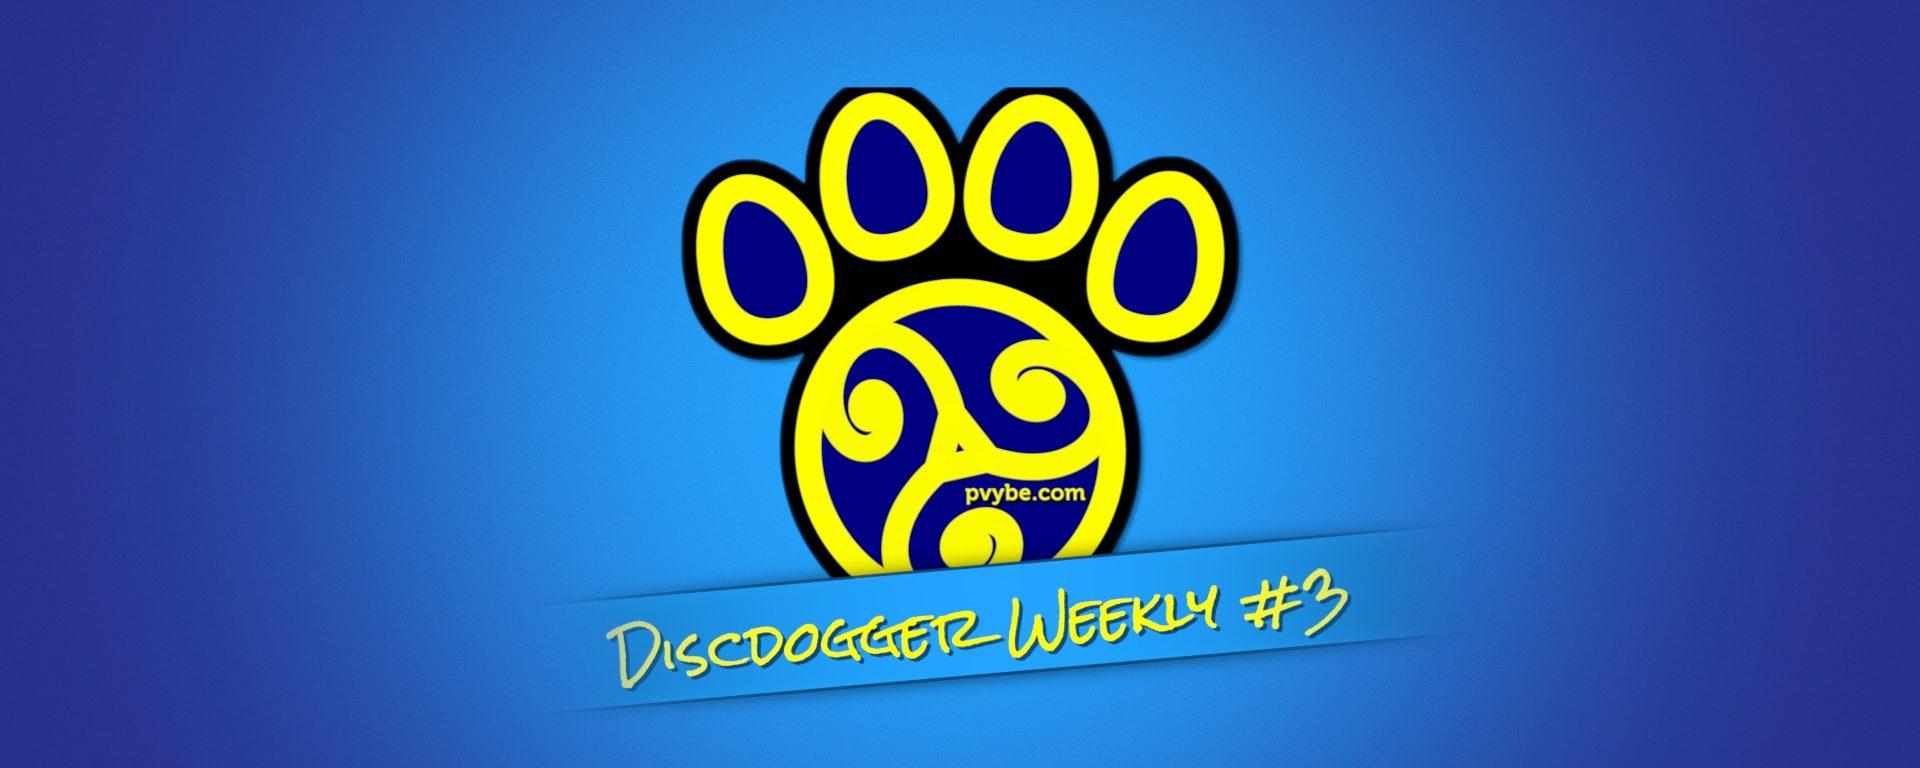 DiscDogger Weekly #3